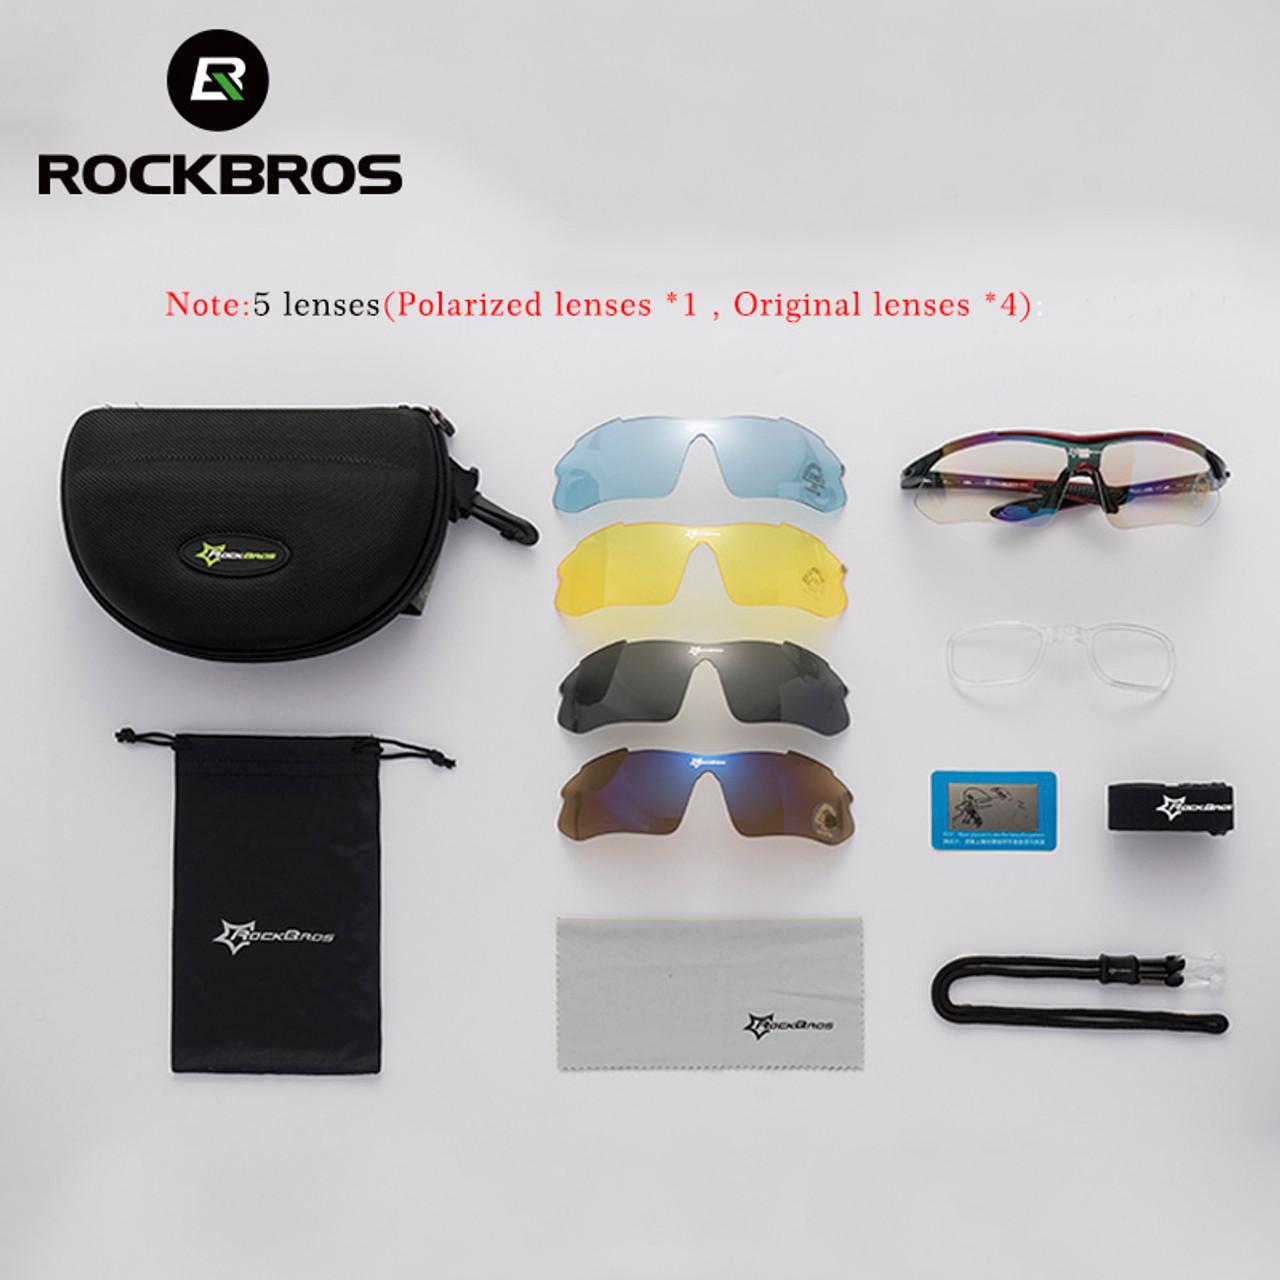 c48c1311c77 ... ROCKBROS Polarized Sports Men Sunglasses Road Cycling Glasses Mountain  Bike Bicycle Riding Protection Goggles Eyewear 5 ...